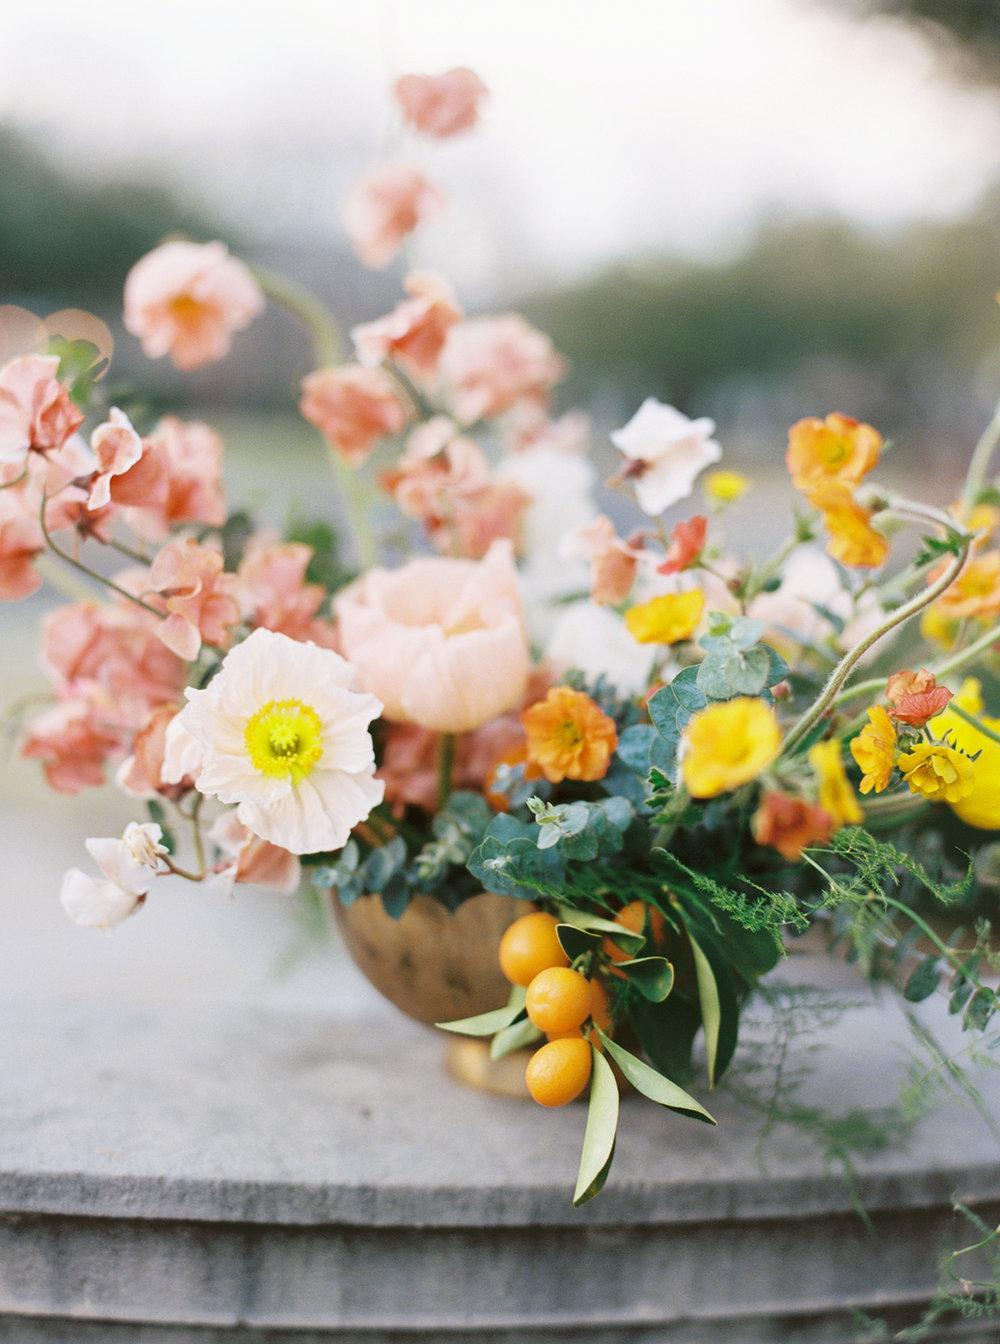 Fine Art Wedding Florist - Dallas, Texas - Olive Grove Design - 00074.jpg